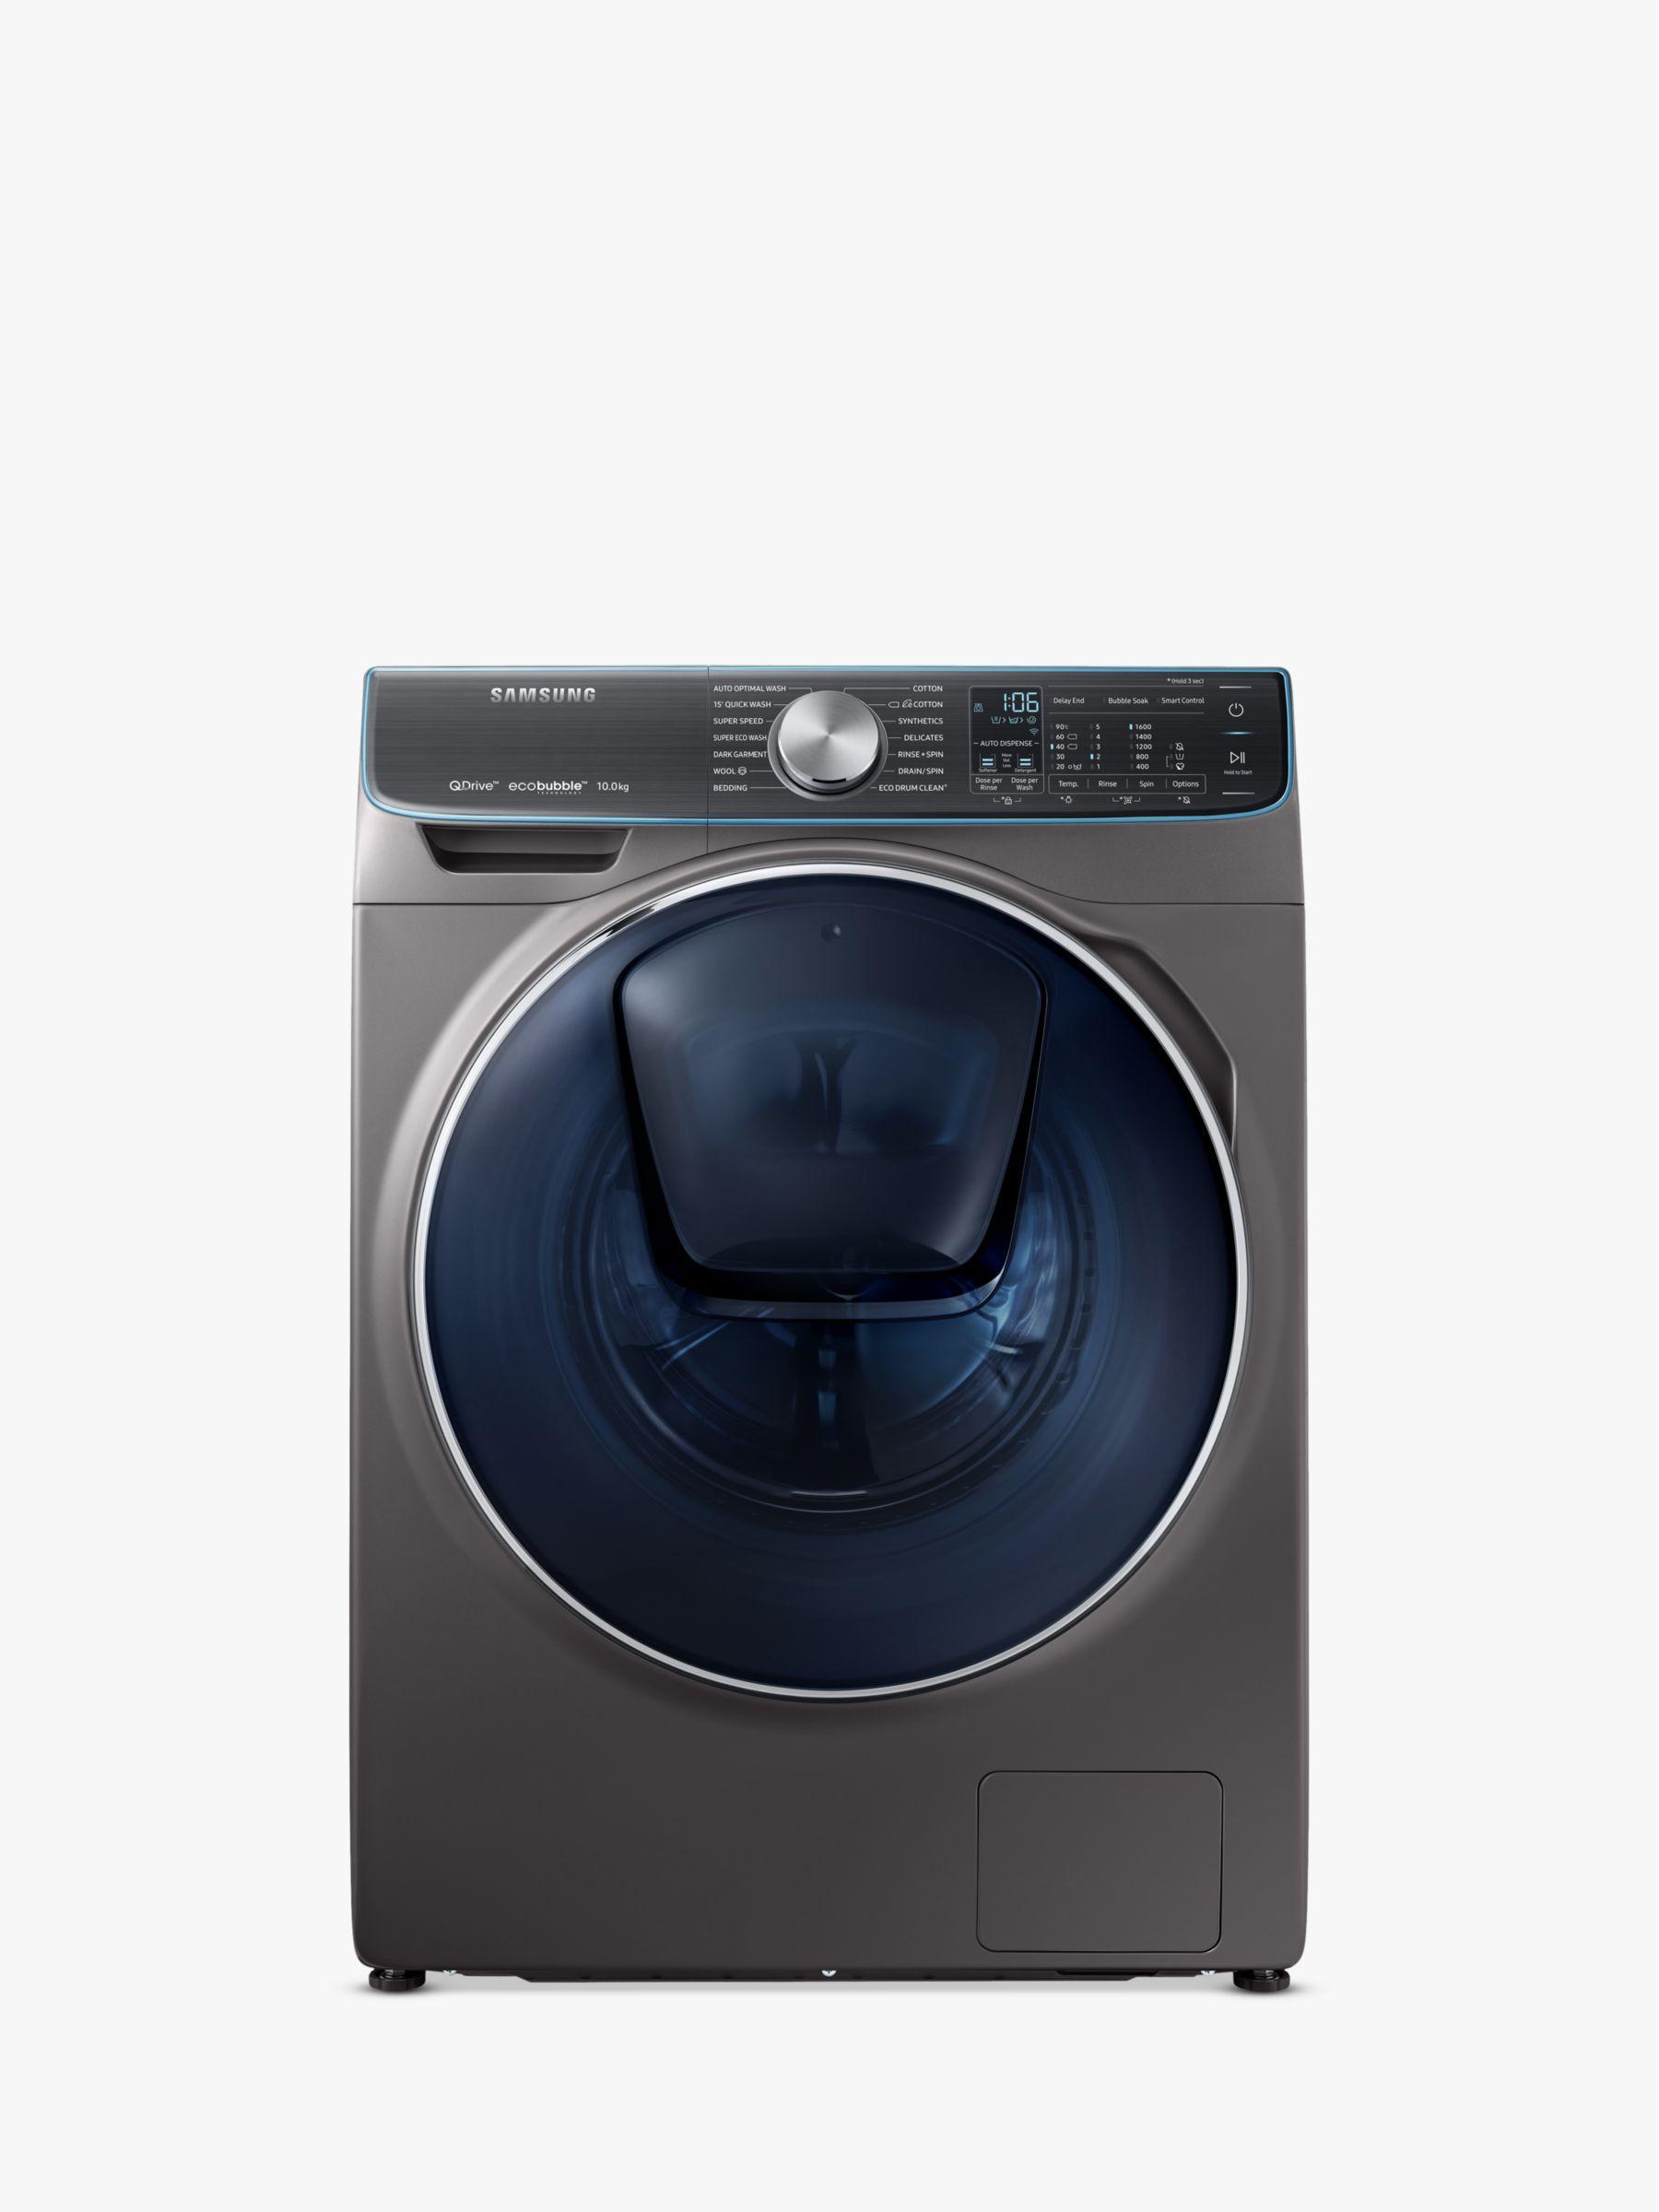 Samsung Samsung WW10M86DQOO/EU Freestanding QuickDrive Washing Machine, 10kg Load, A+++ Energy Rating, 1600rpm Spin, Graphite